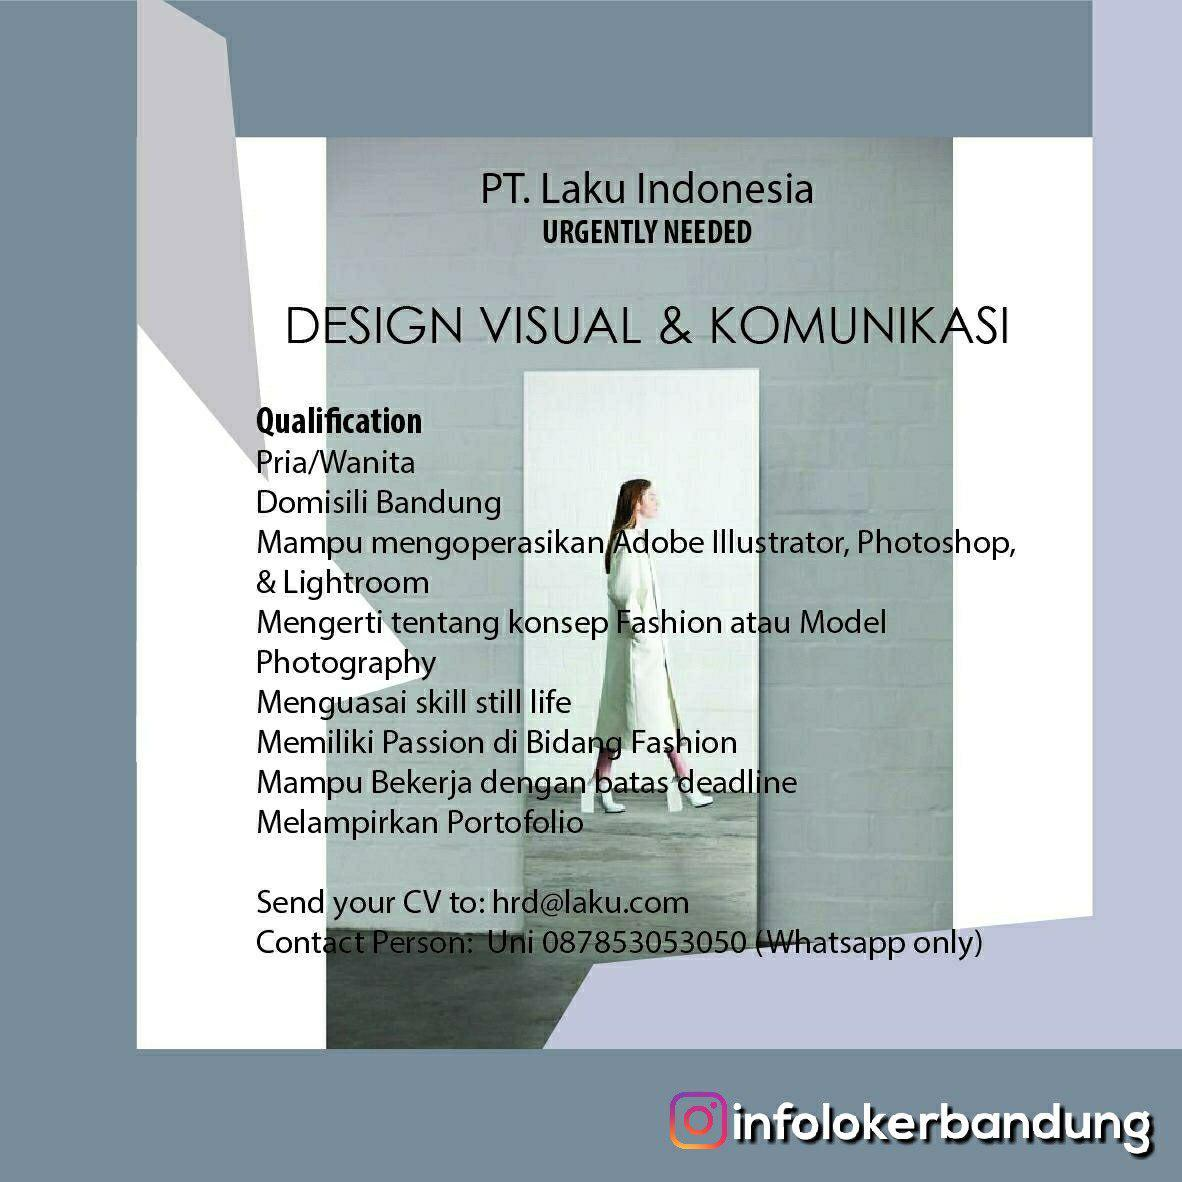 Lowongan Kerja Design Visual & Komunikasi PT. Laku Indonesna Bandung November 2018